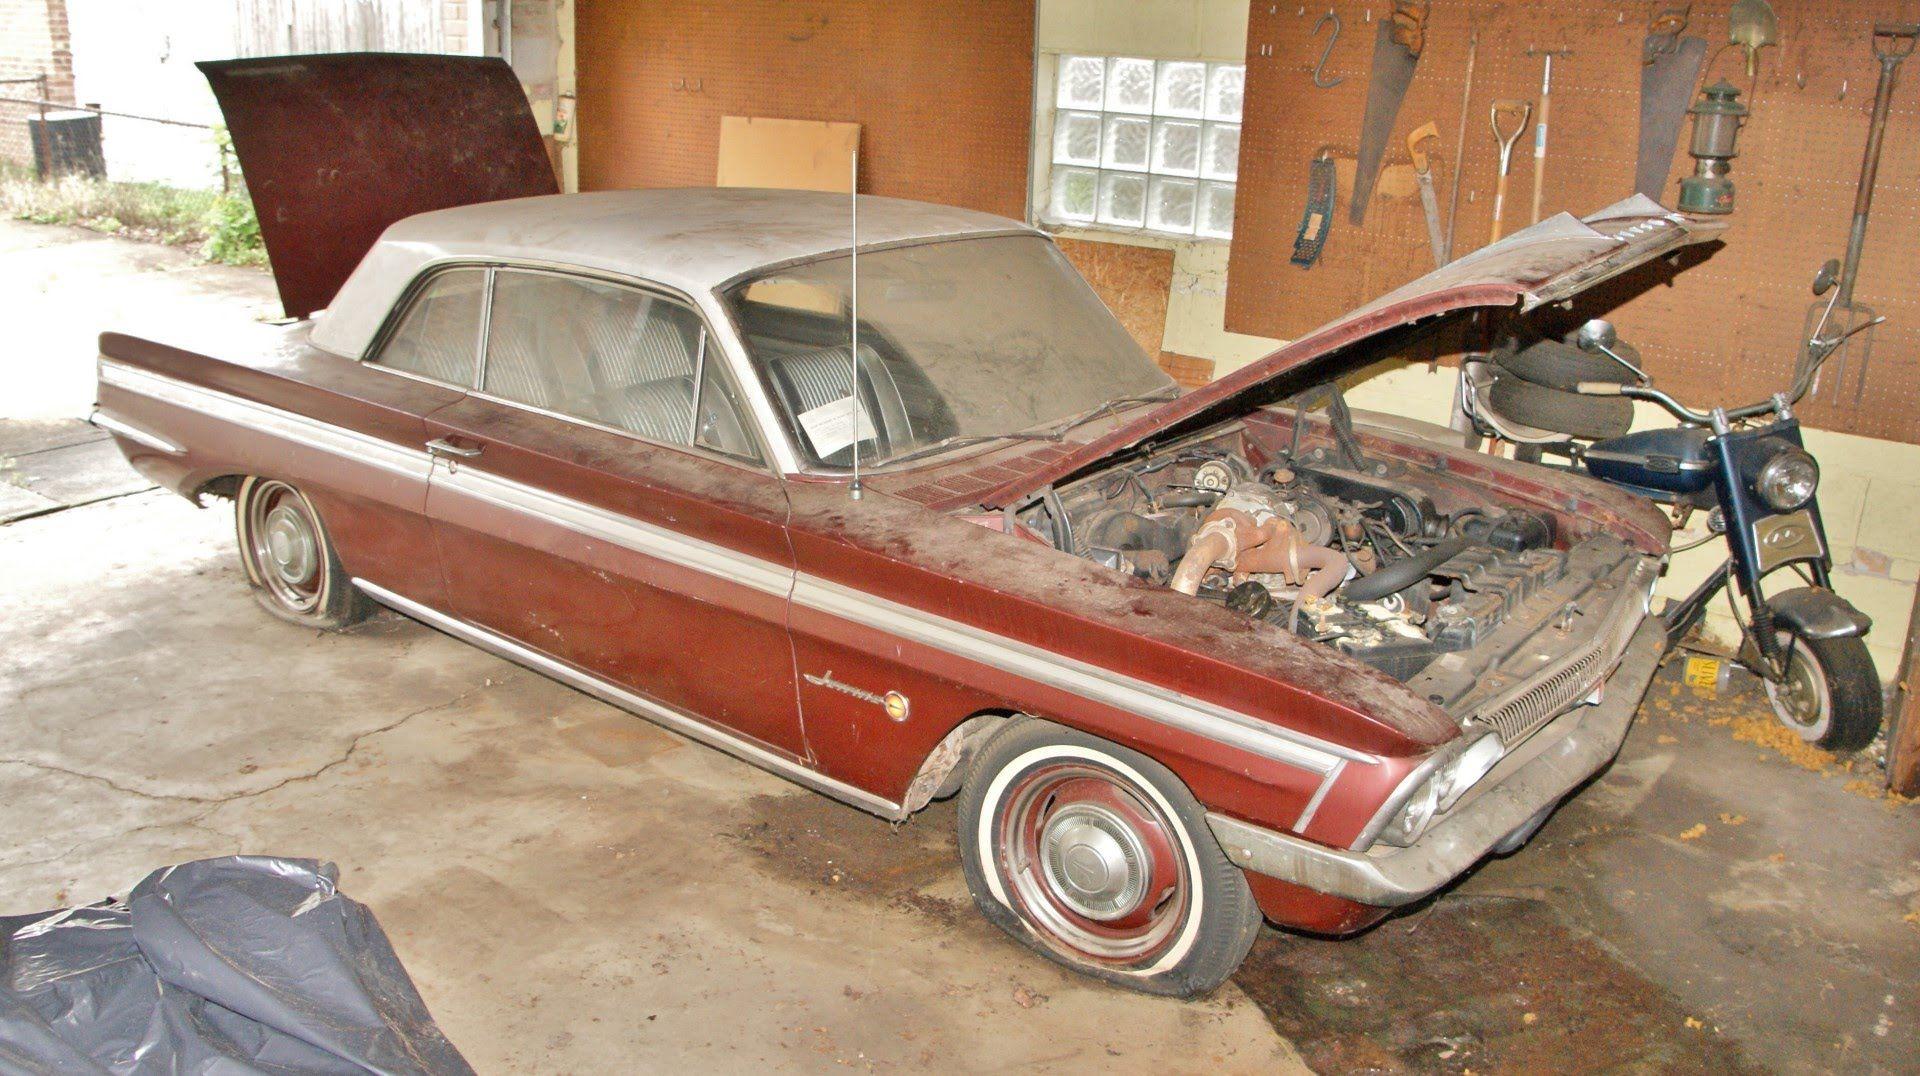 The Garage Find 1962 Oldsmobile Jetfire V8 Factory Turbo The